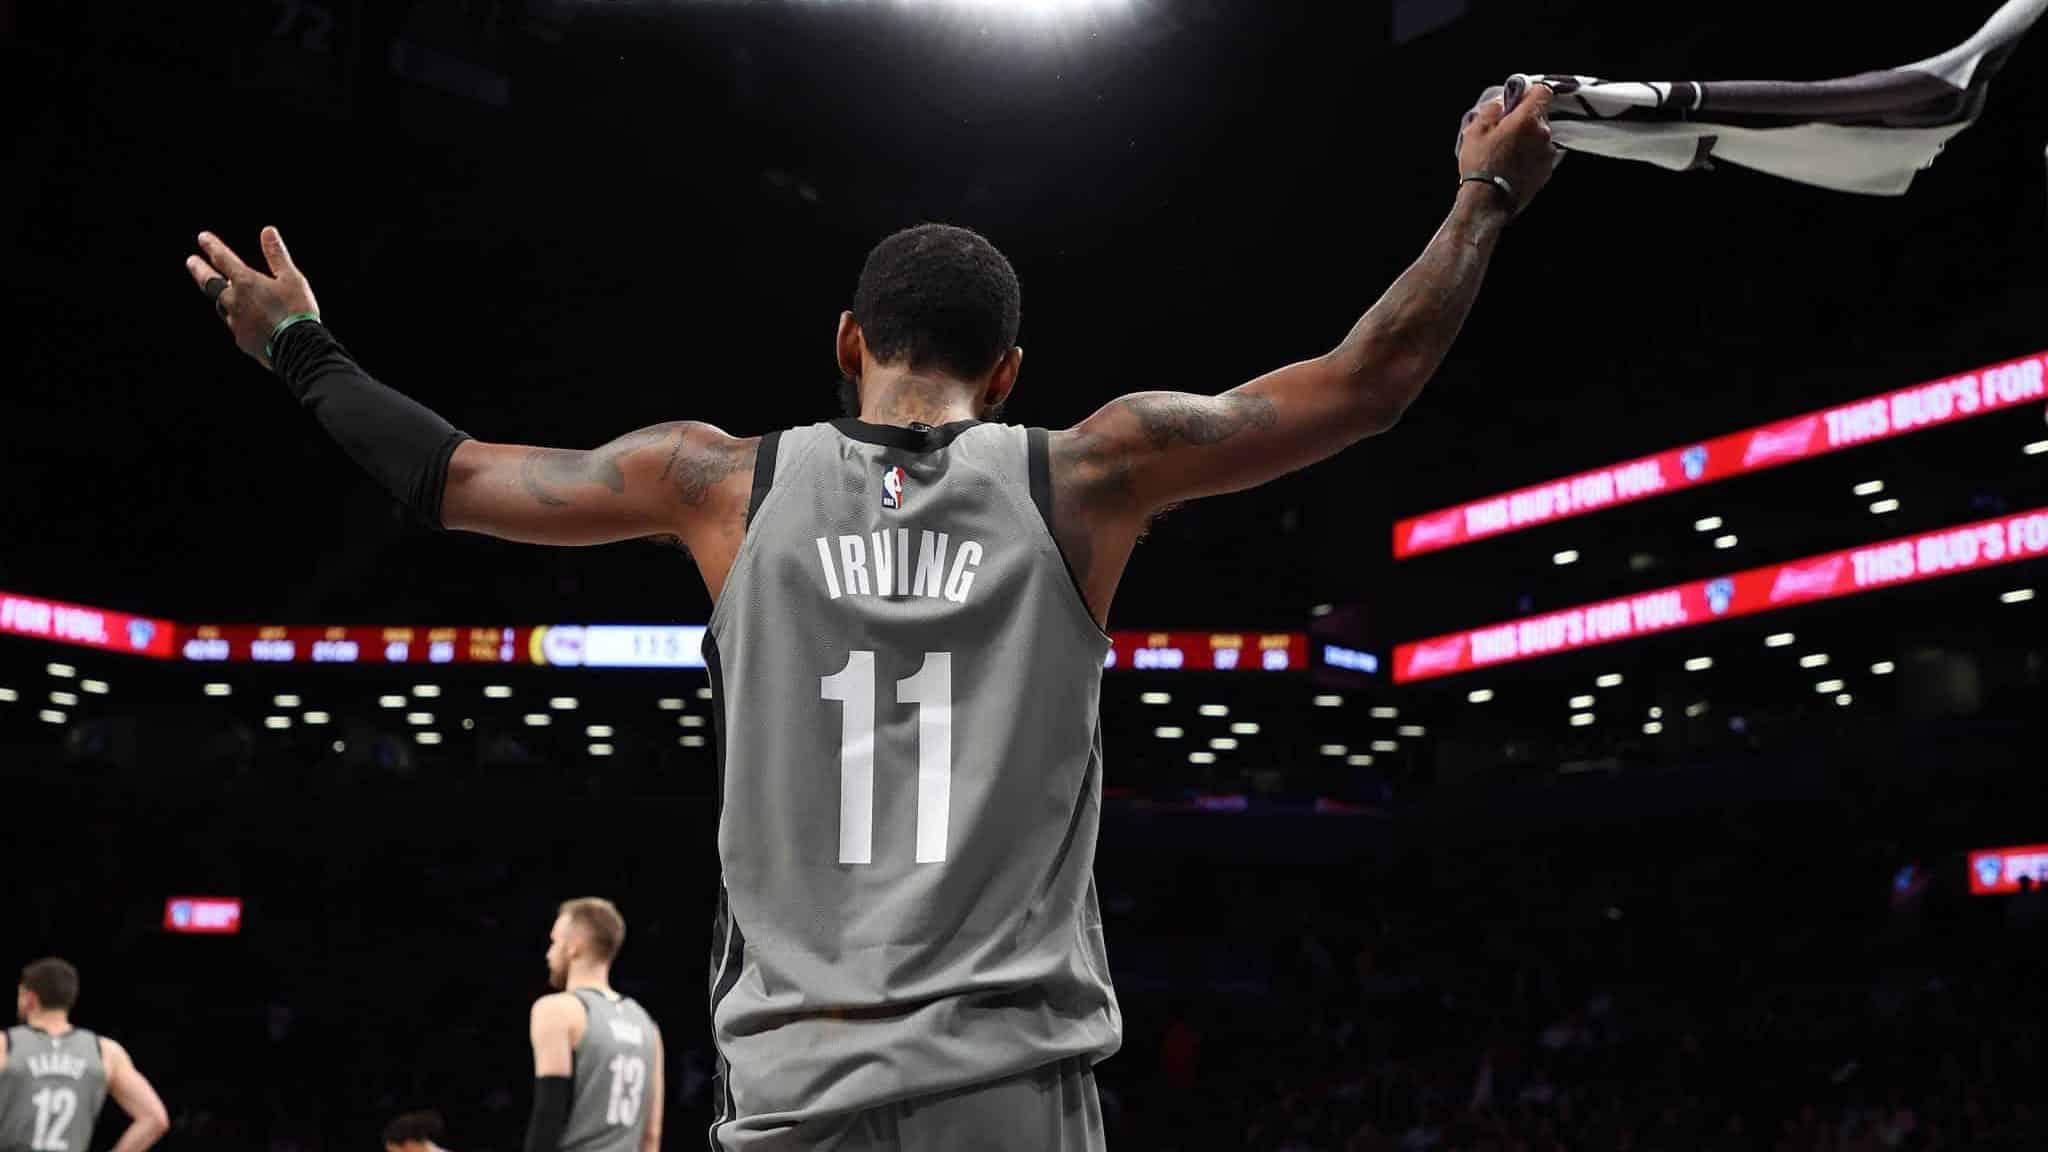 Kyrie Irving Brooklyn Nets , HD Wallpaper & Backgrounds